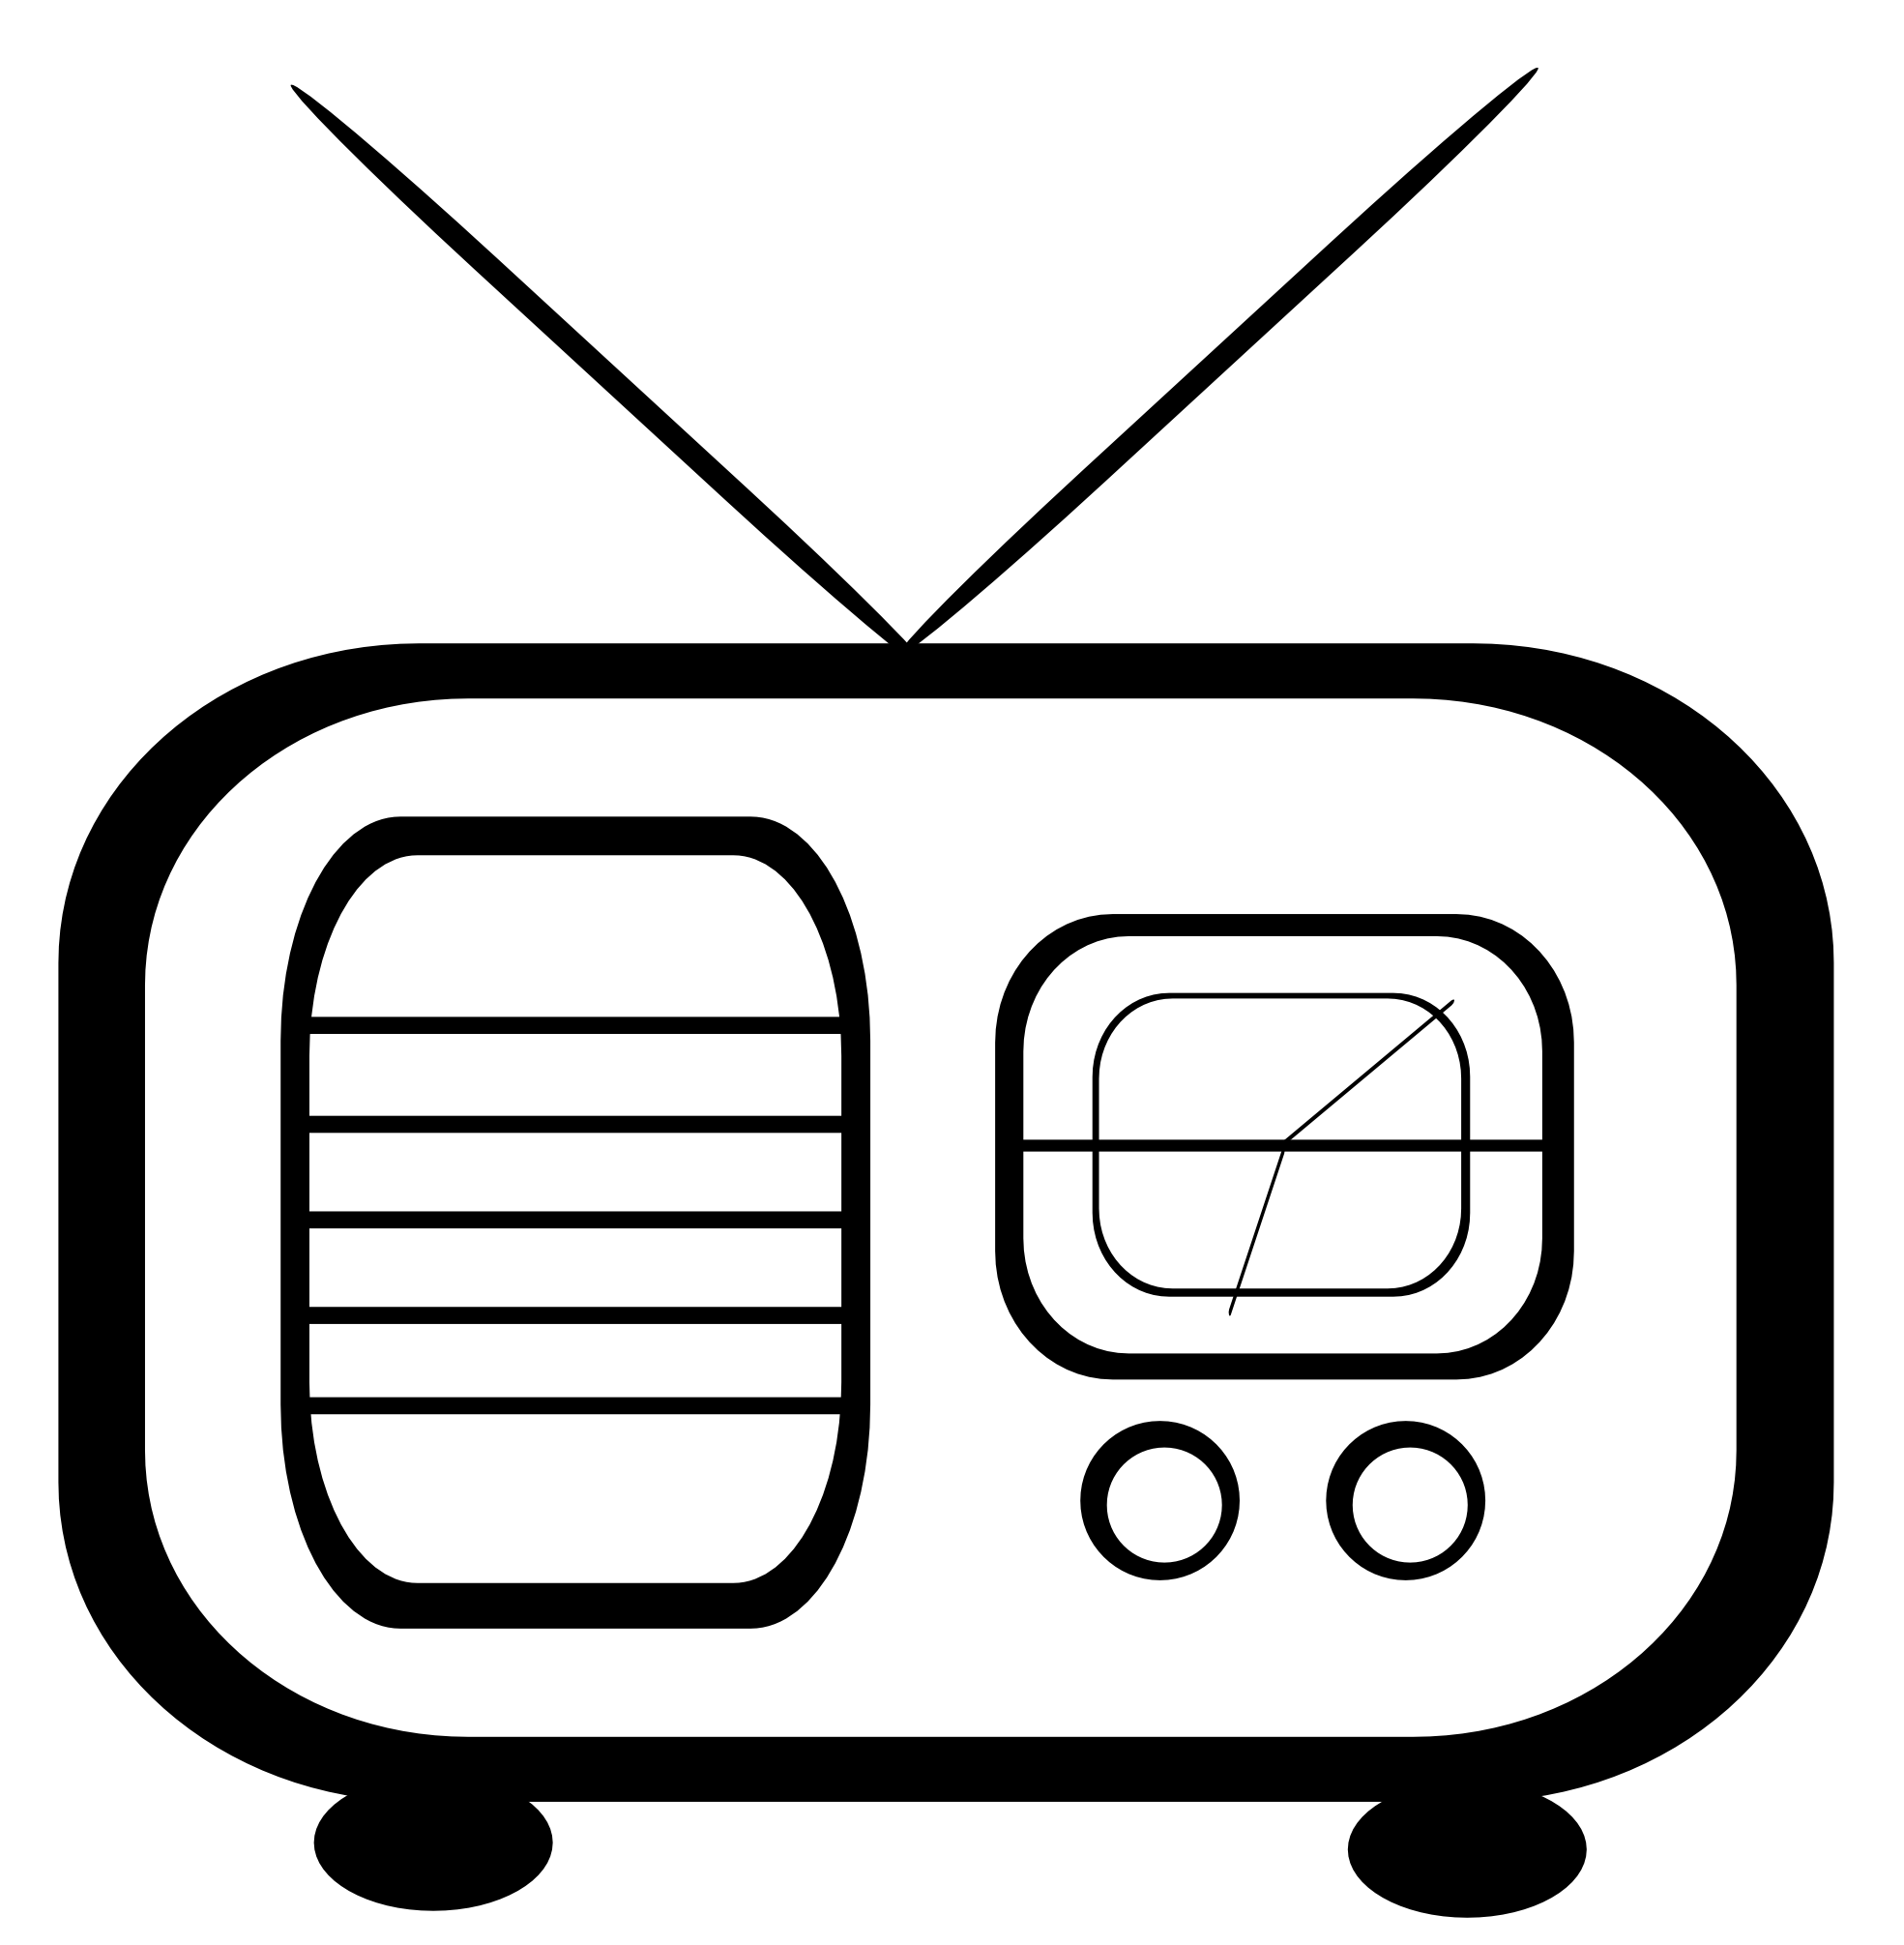 Bw . Electronics clipart transparent